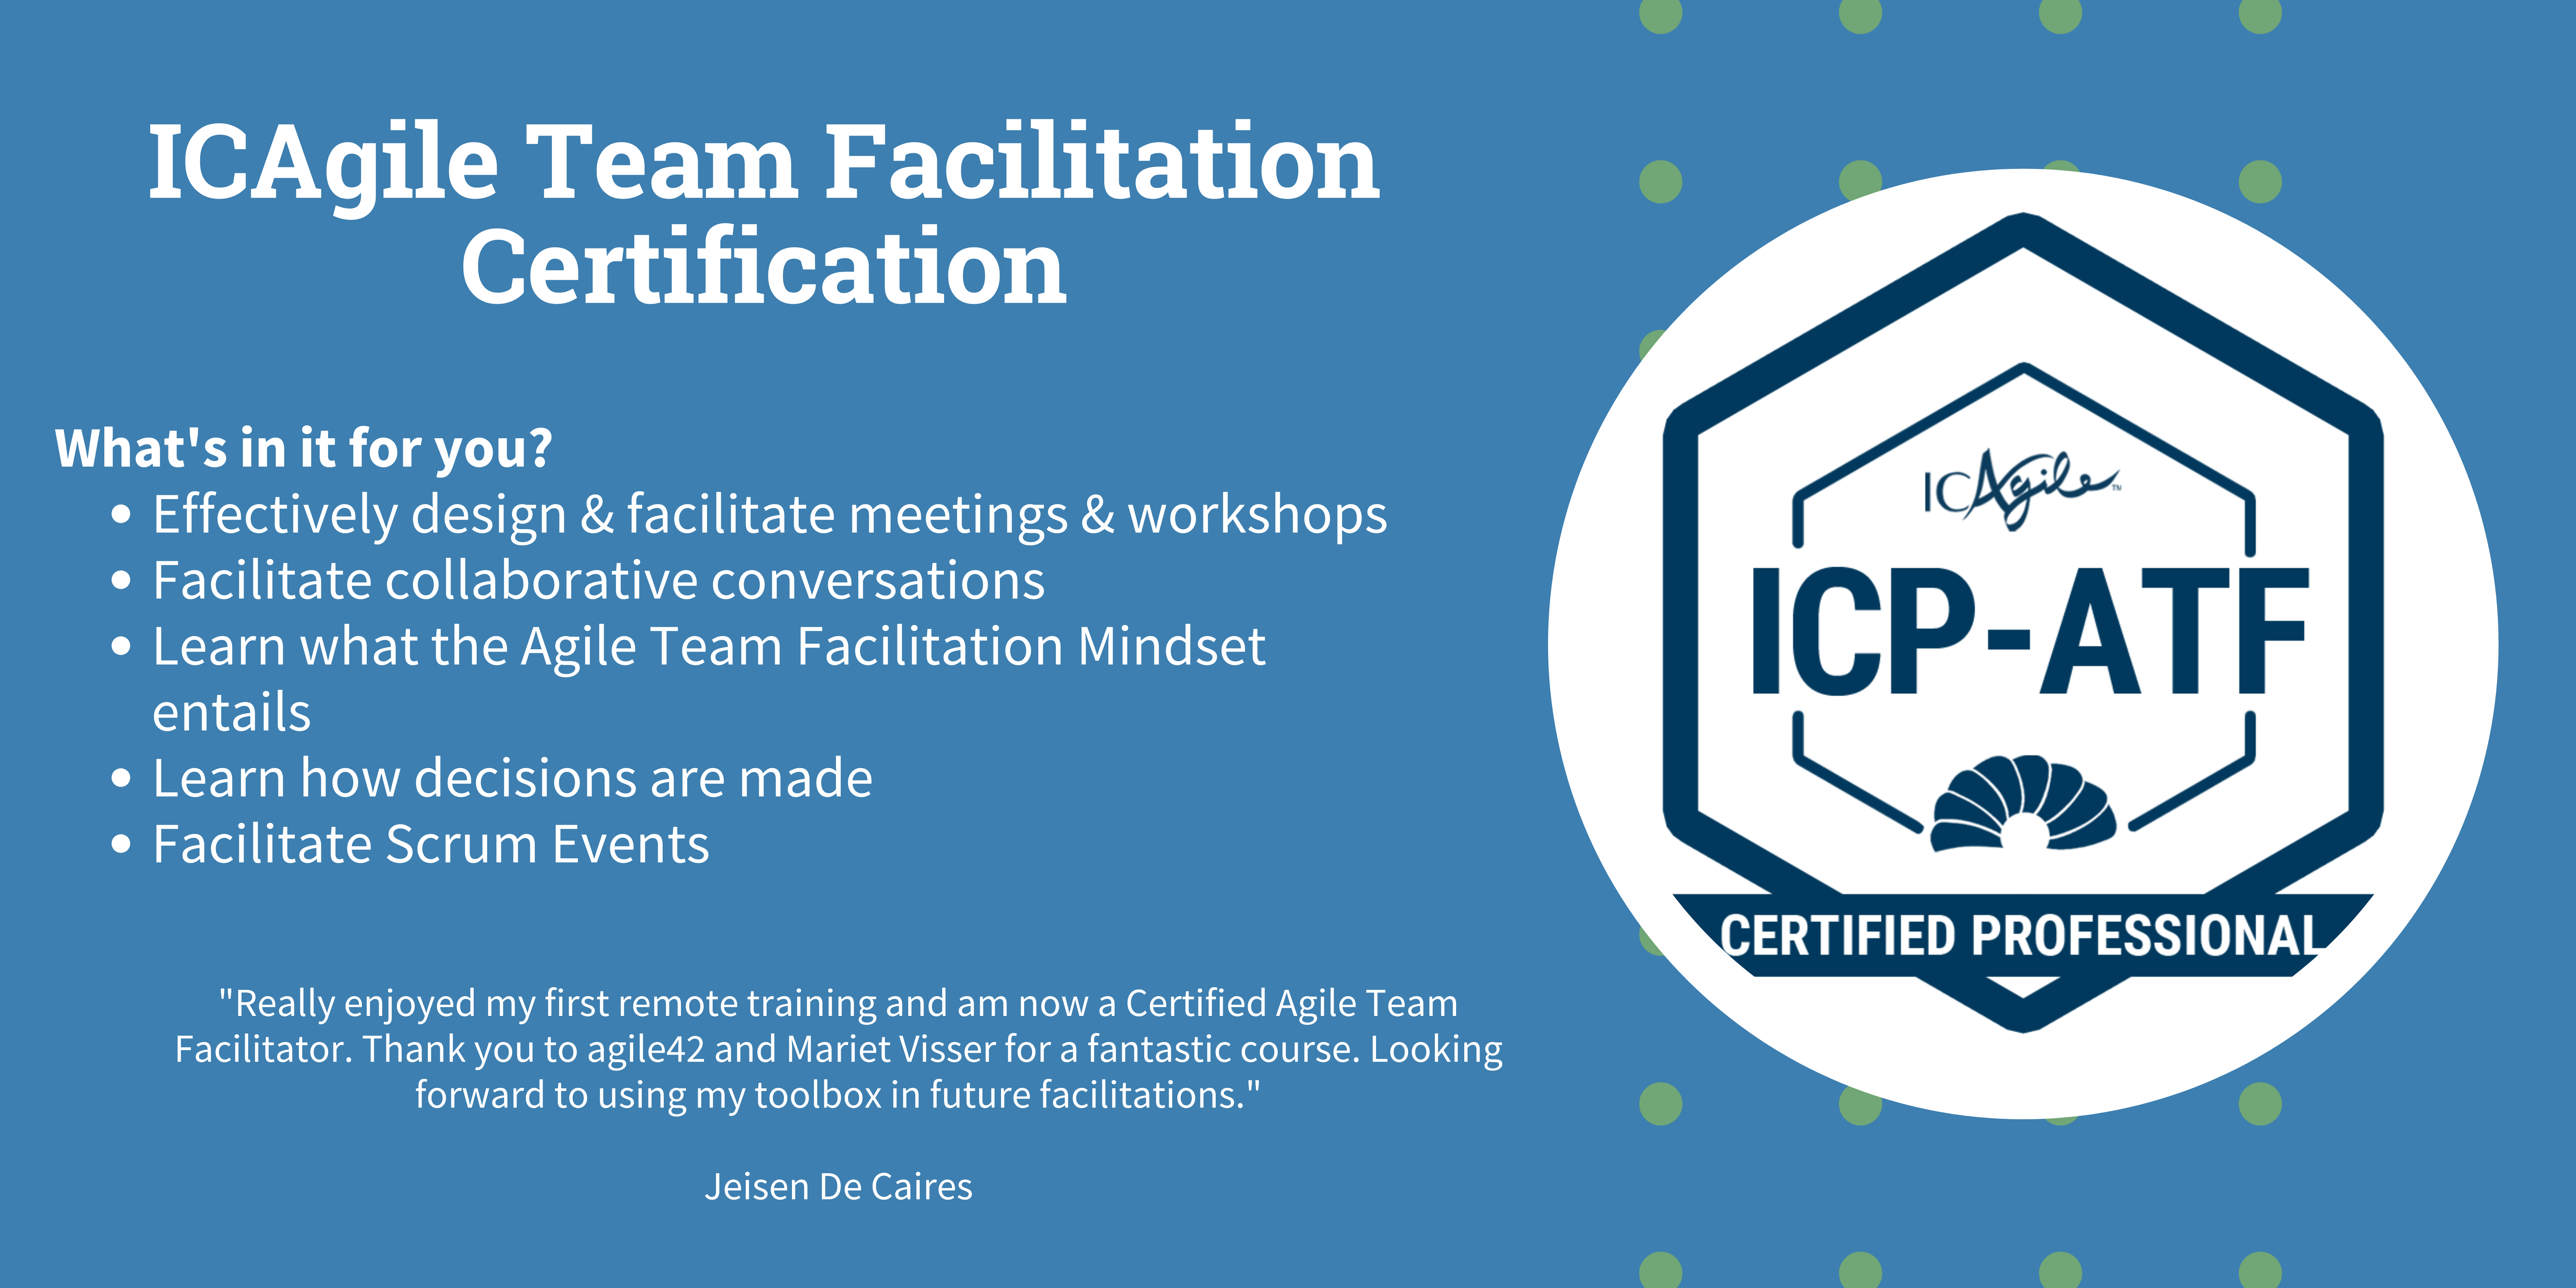 ICAgile Team Facilitation Certification